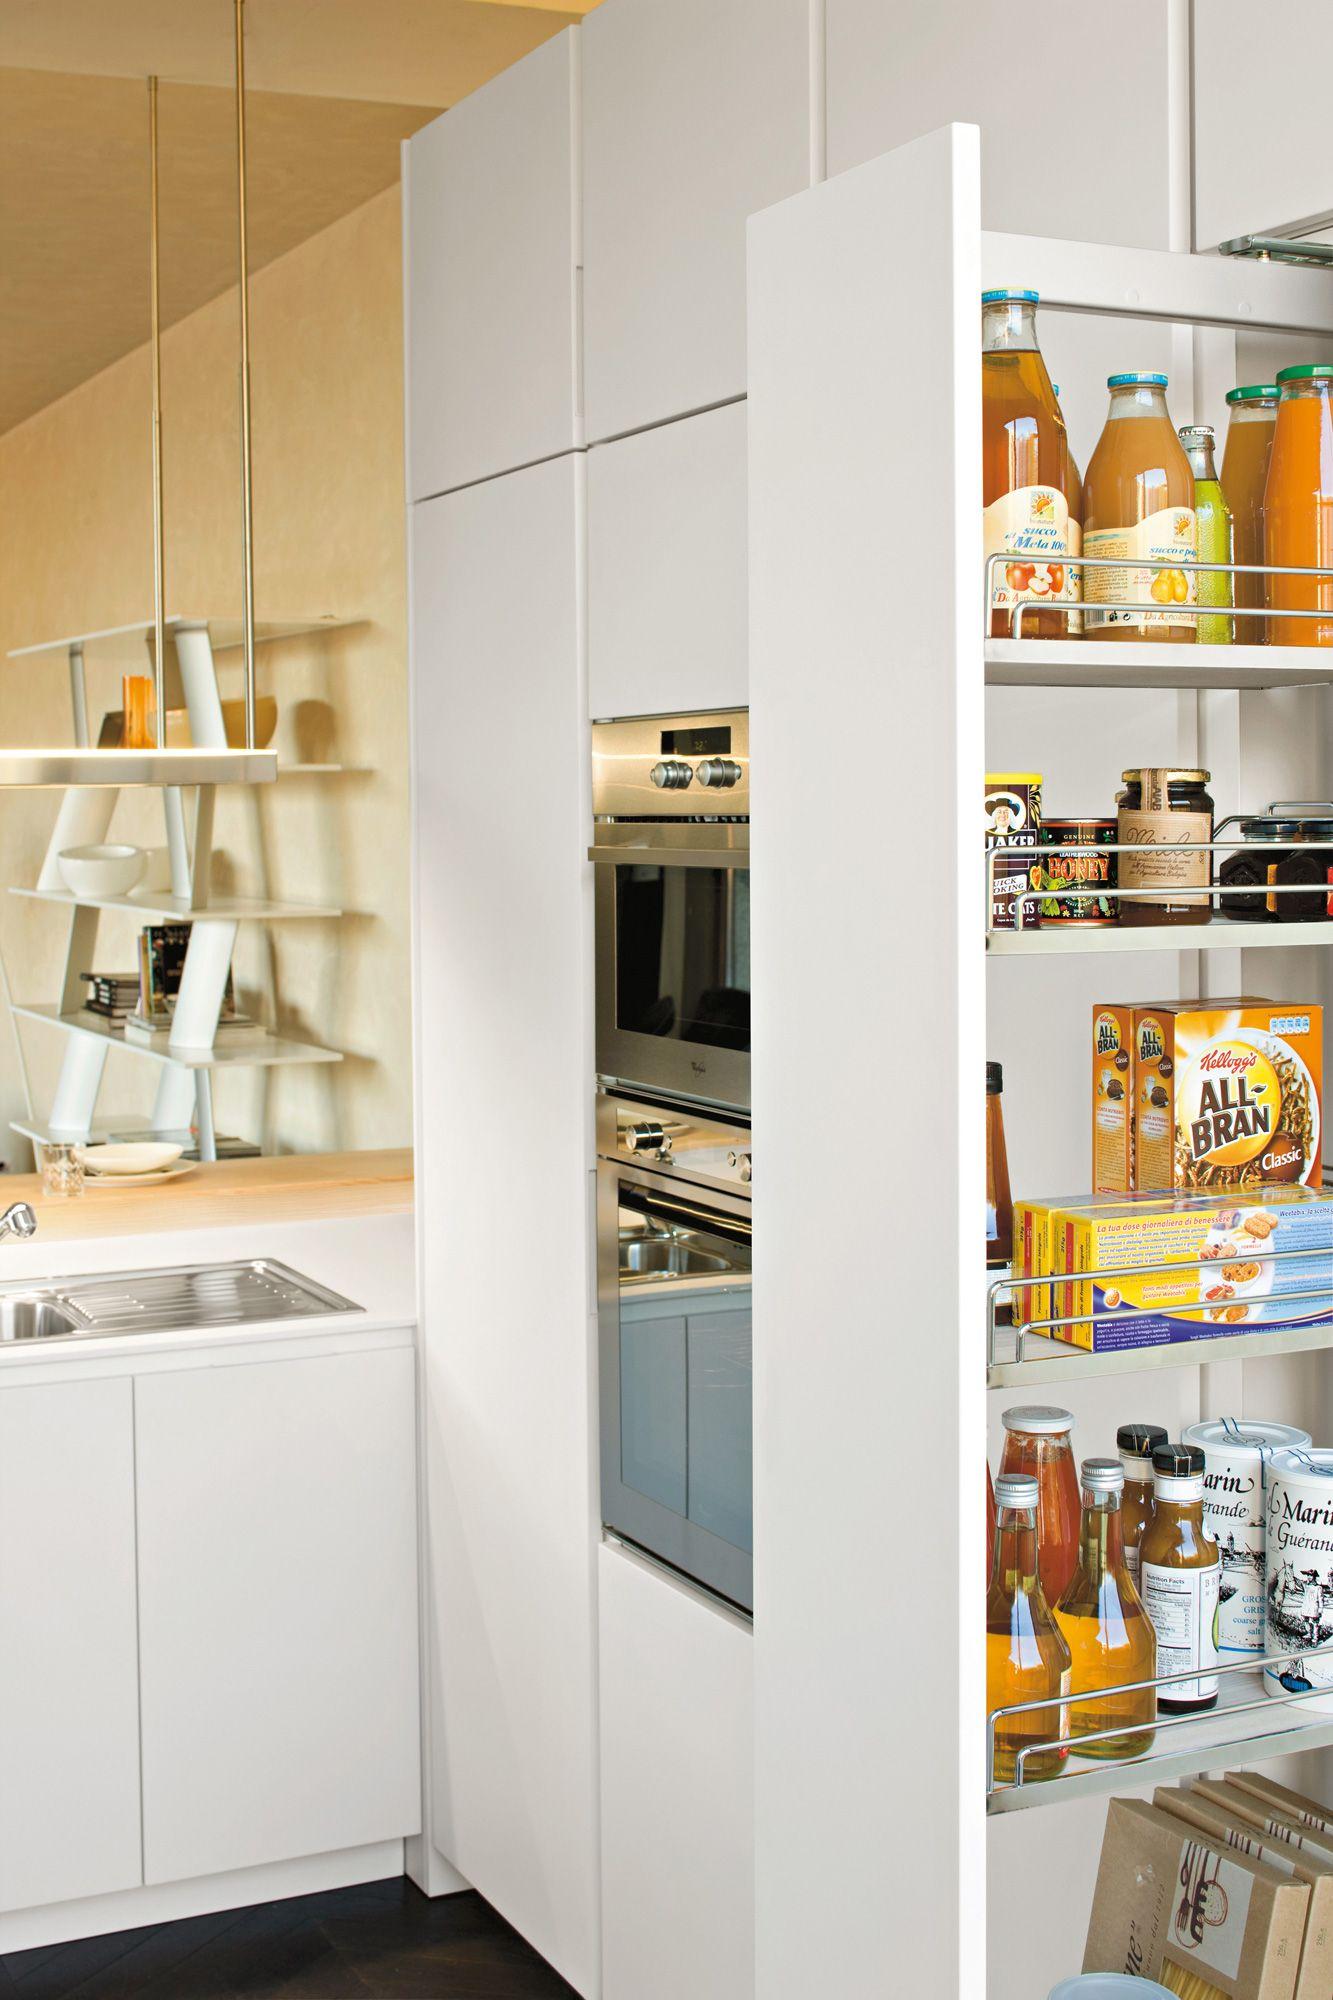 armadio dispensa cucina moderna Orange  arredamento nel 2019